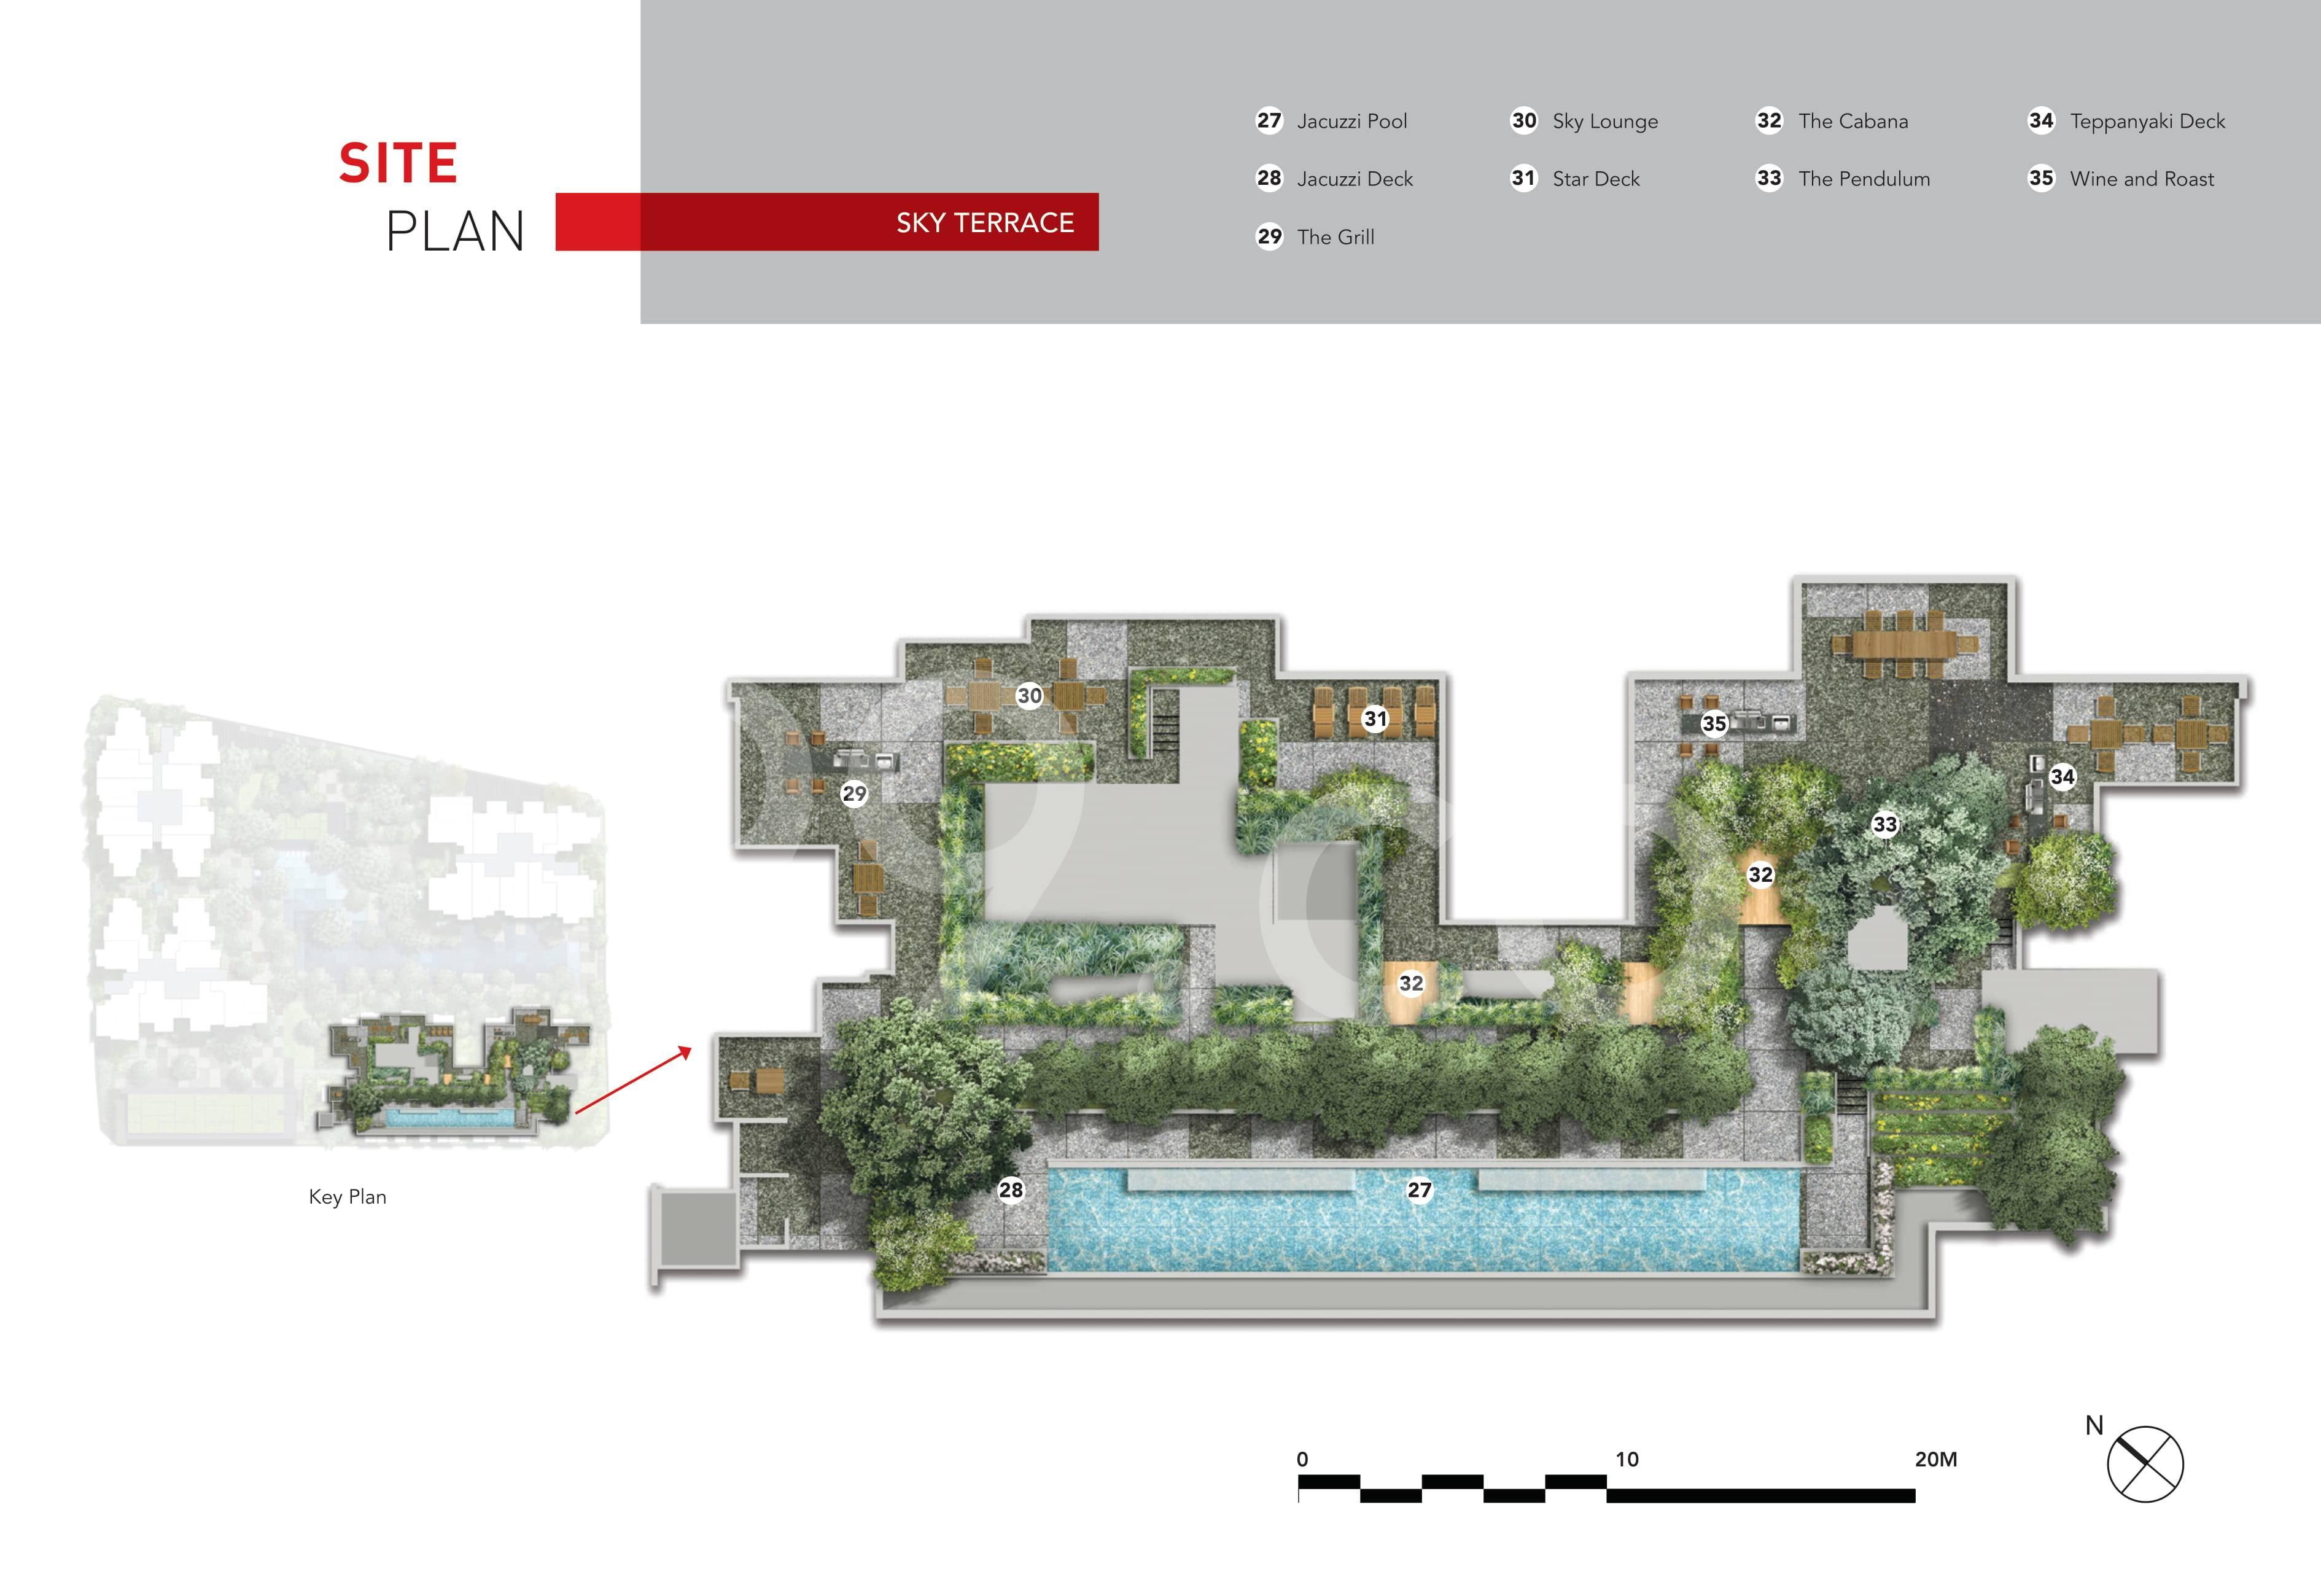 The M site plan